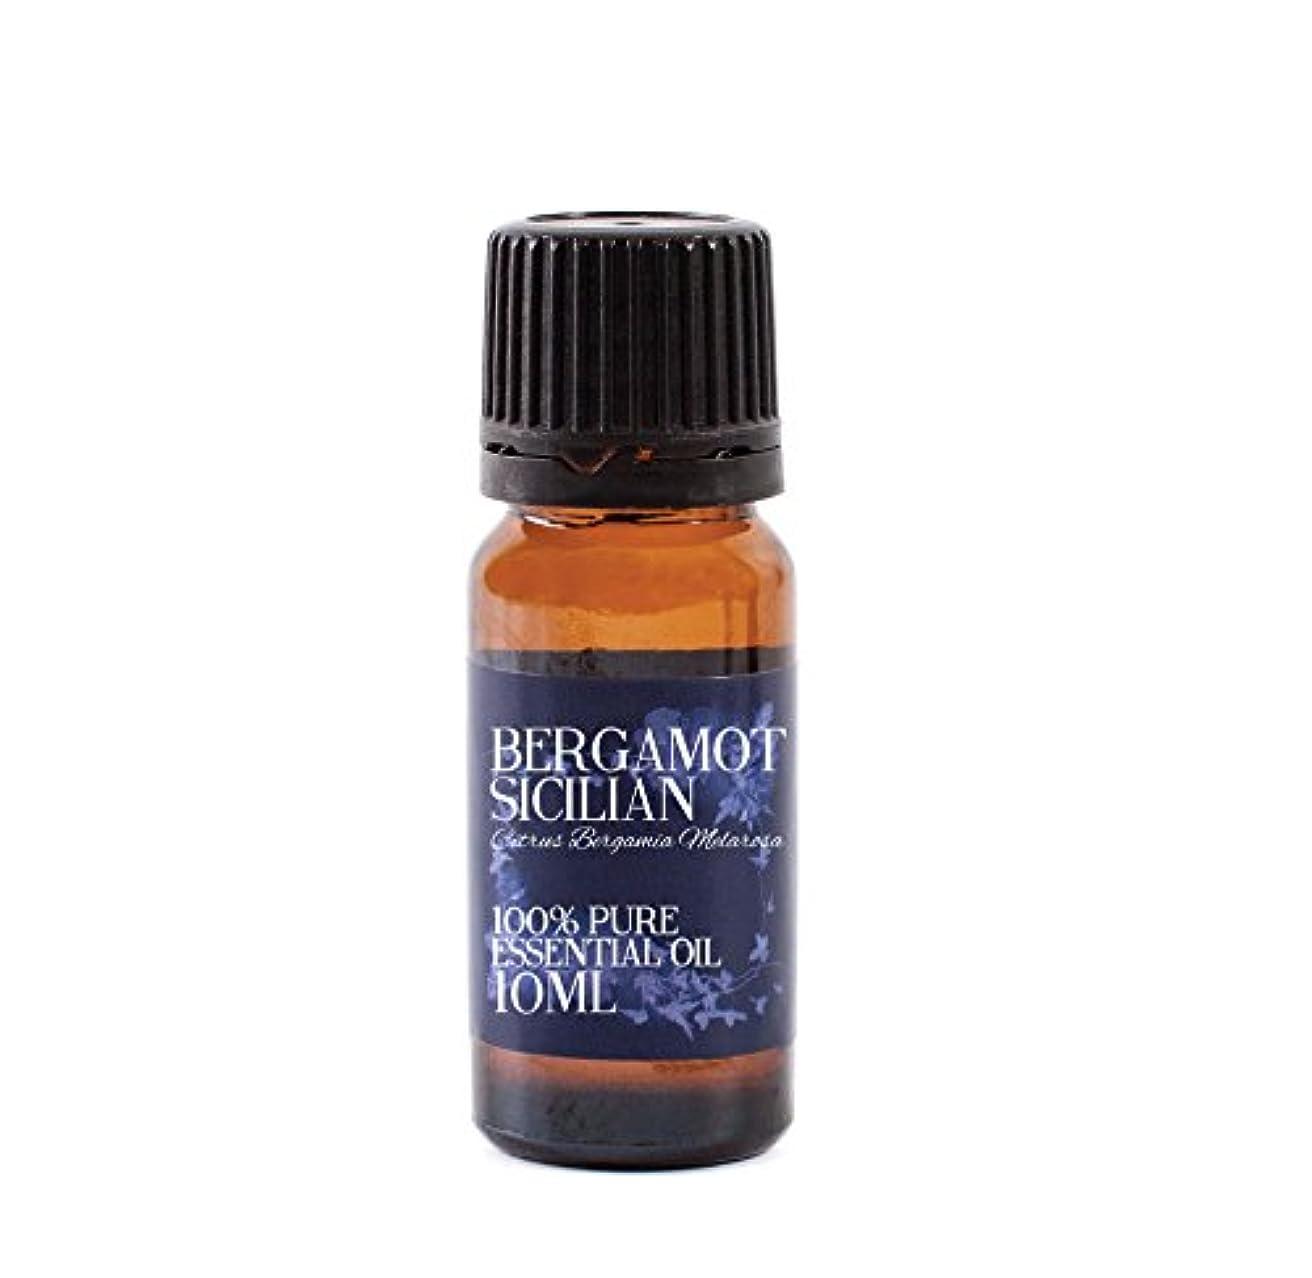 Mystic Moments | Bergamot Sicilian Essential Oil - 10ml - 100% Pure